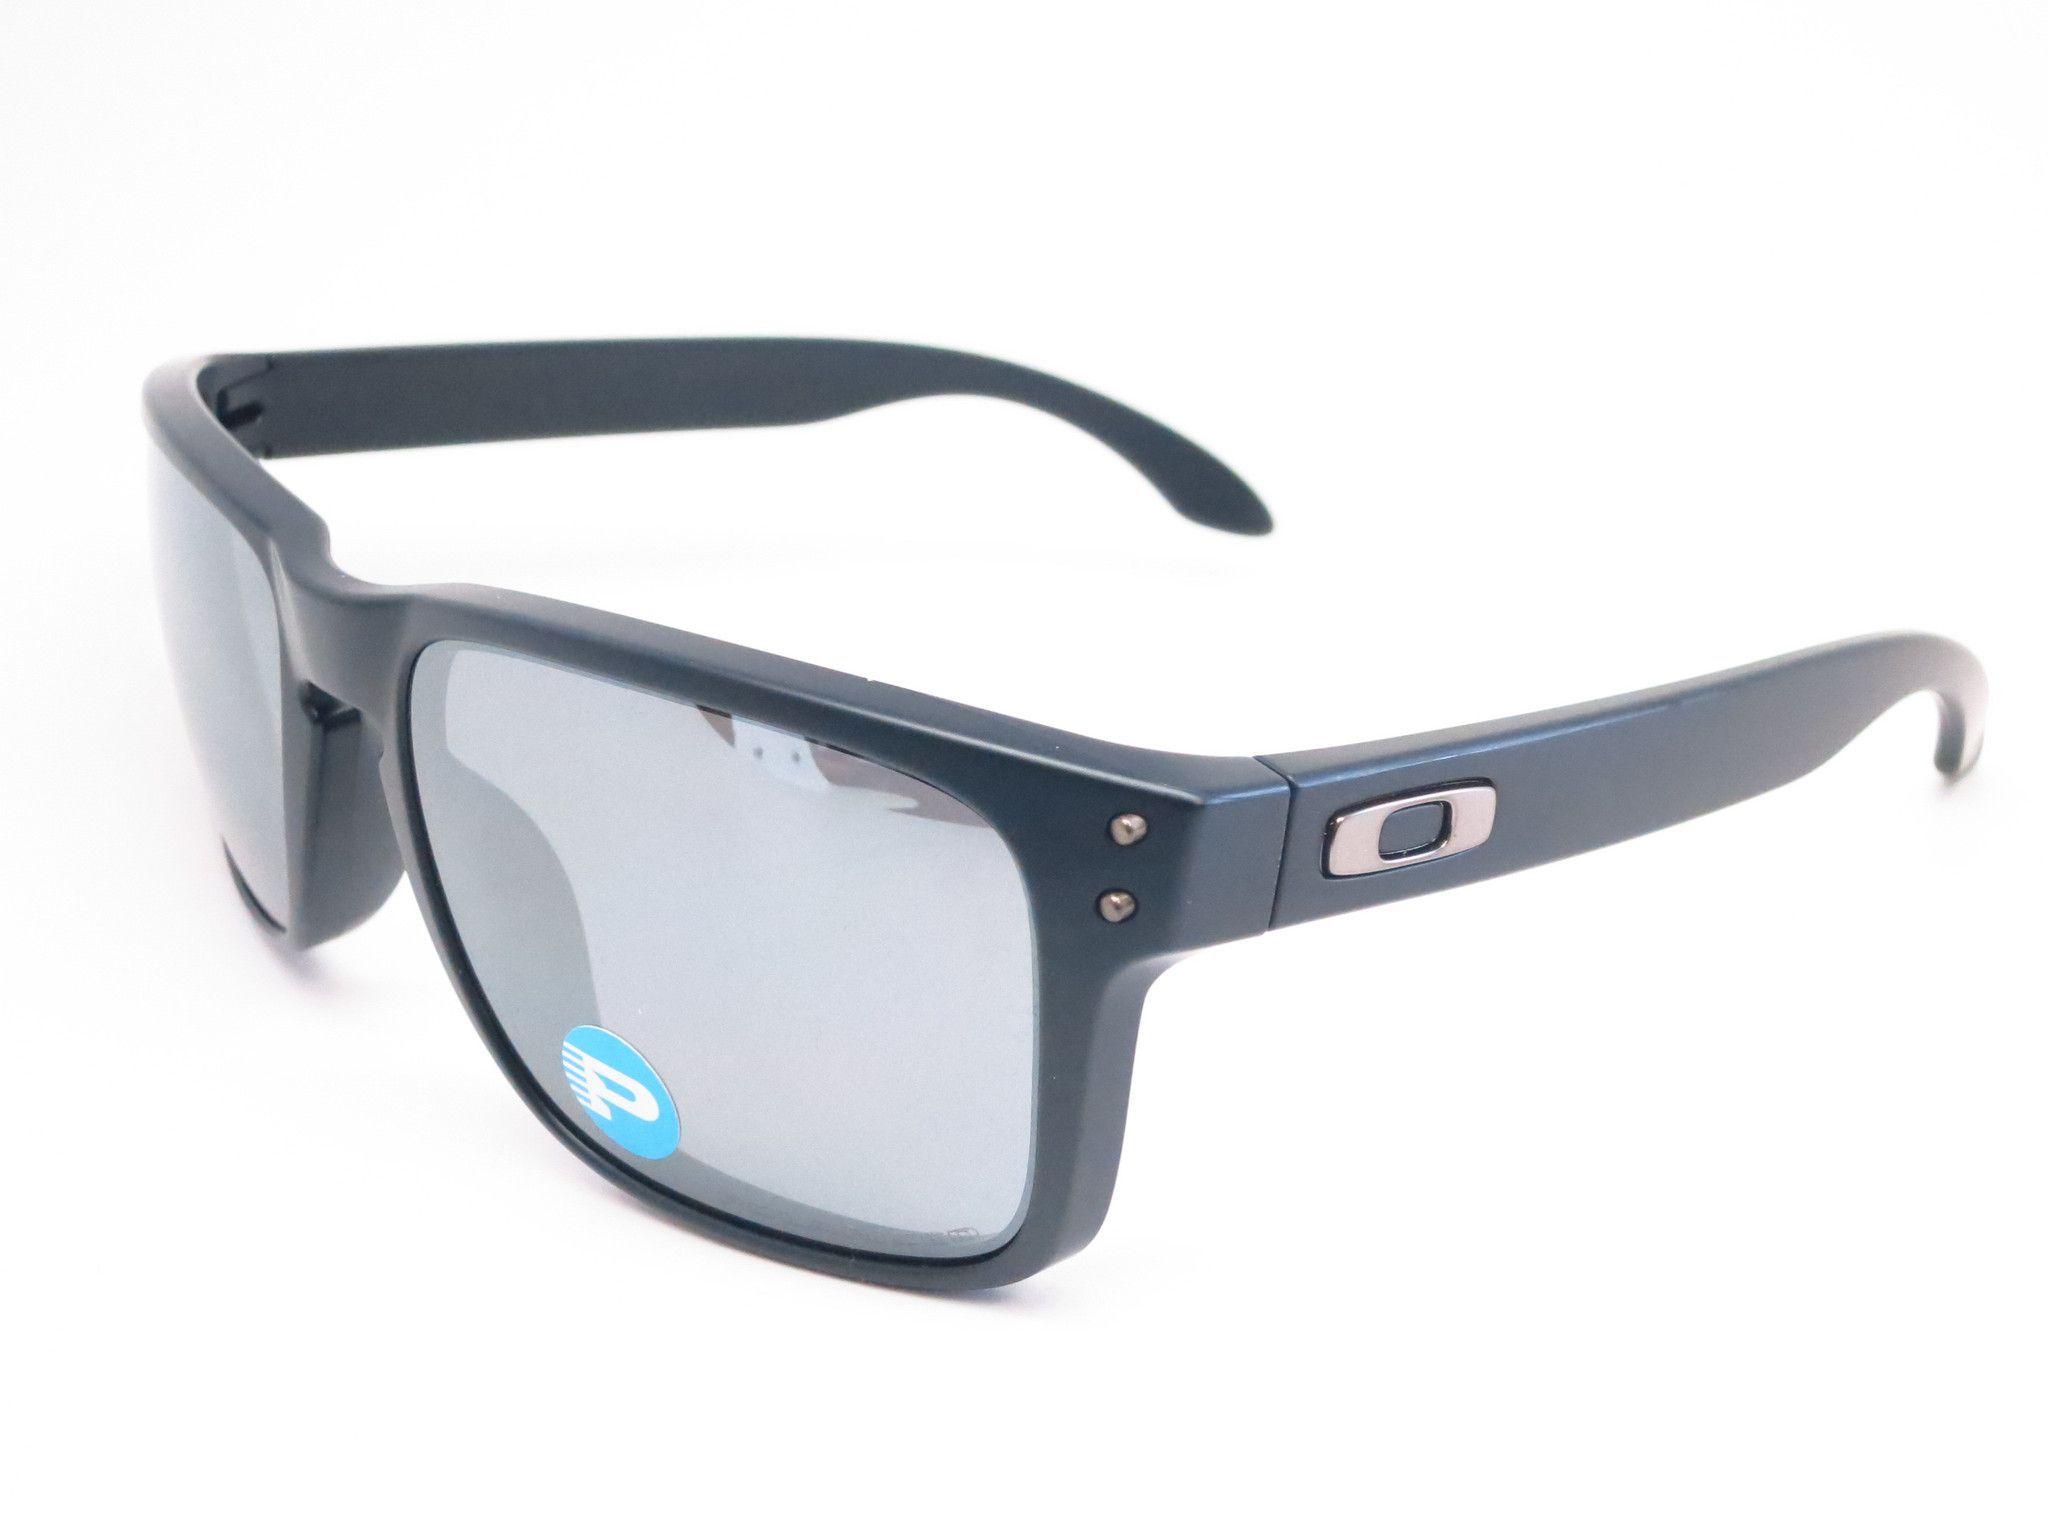 Oakley Holbrook OO9102-62 Matte Black Polarized Sunglasses 42d7872c89